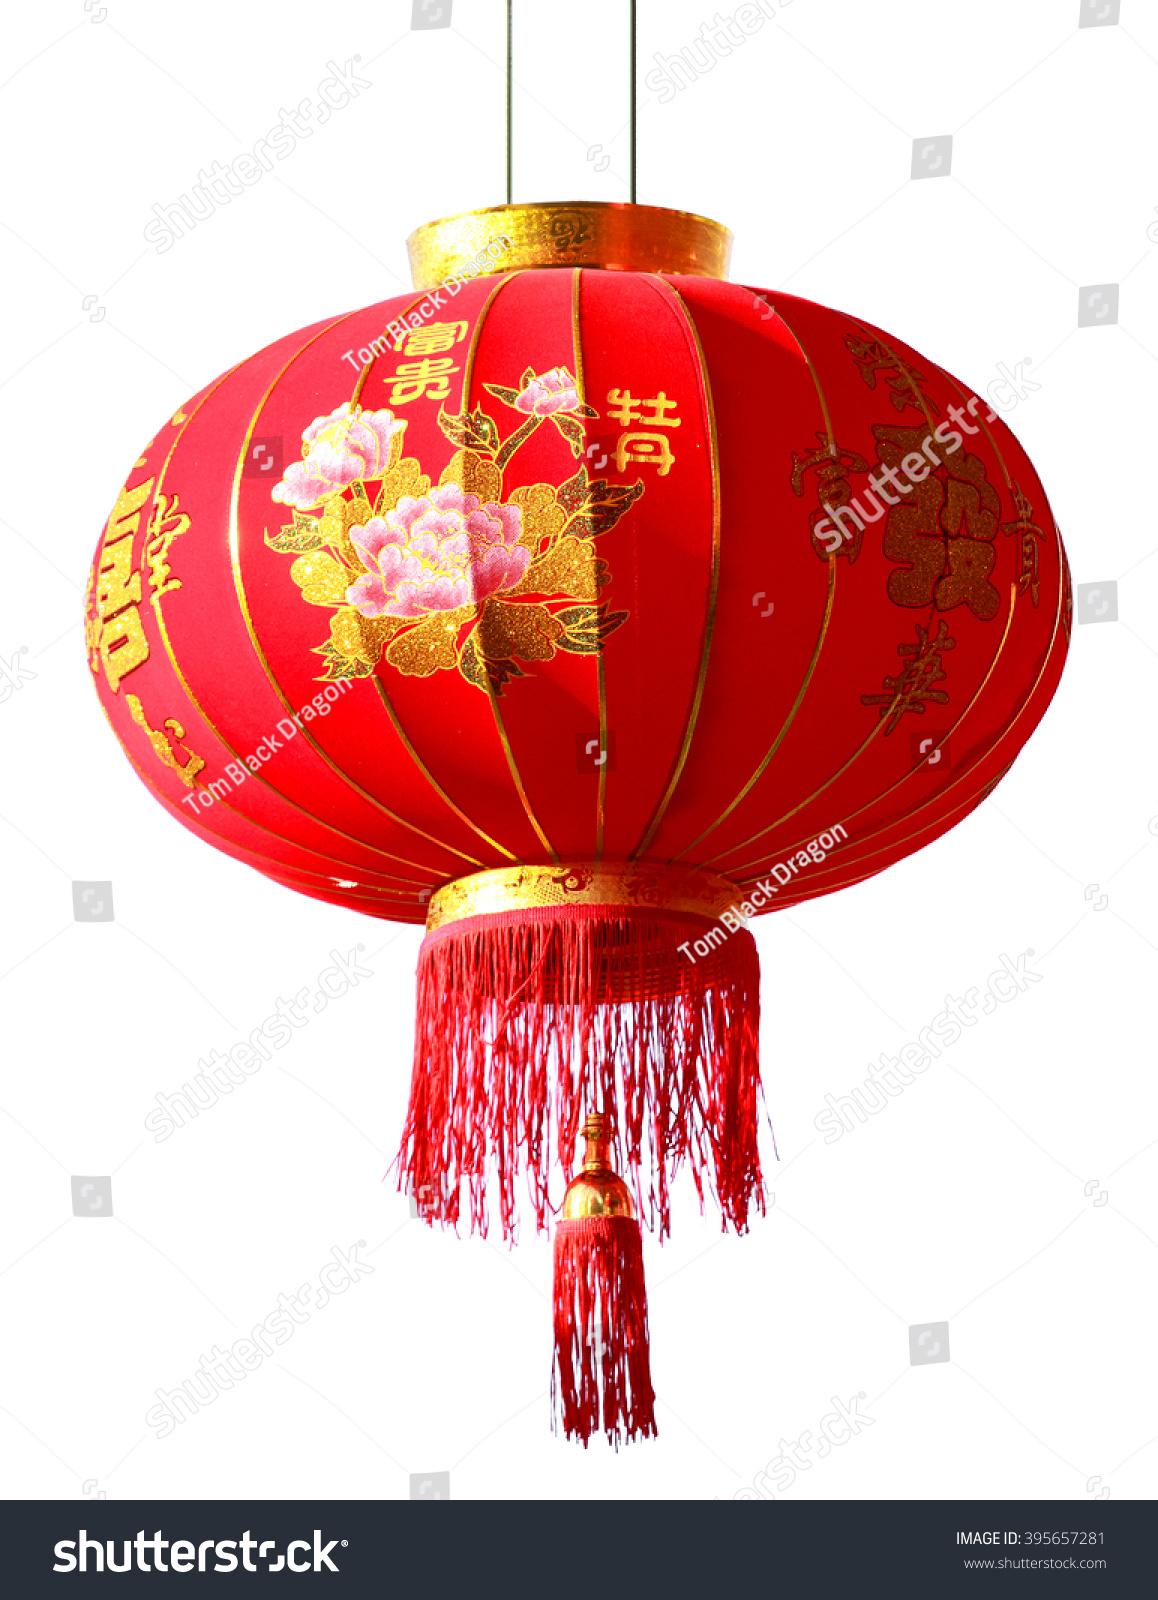 Chinese Lantern The Symbolic China Tradition Stock Photo Royalty